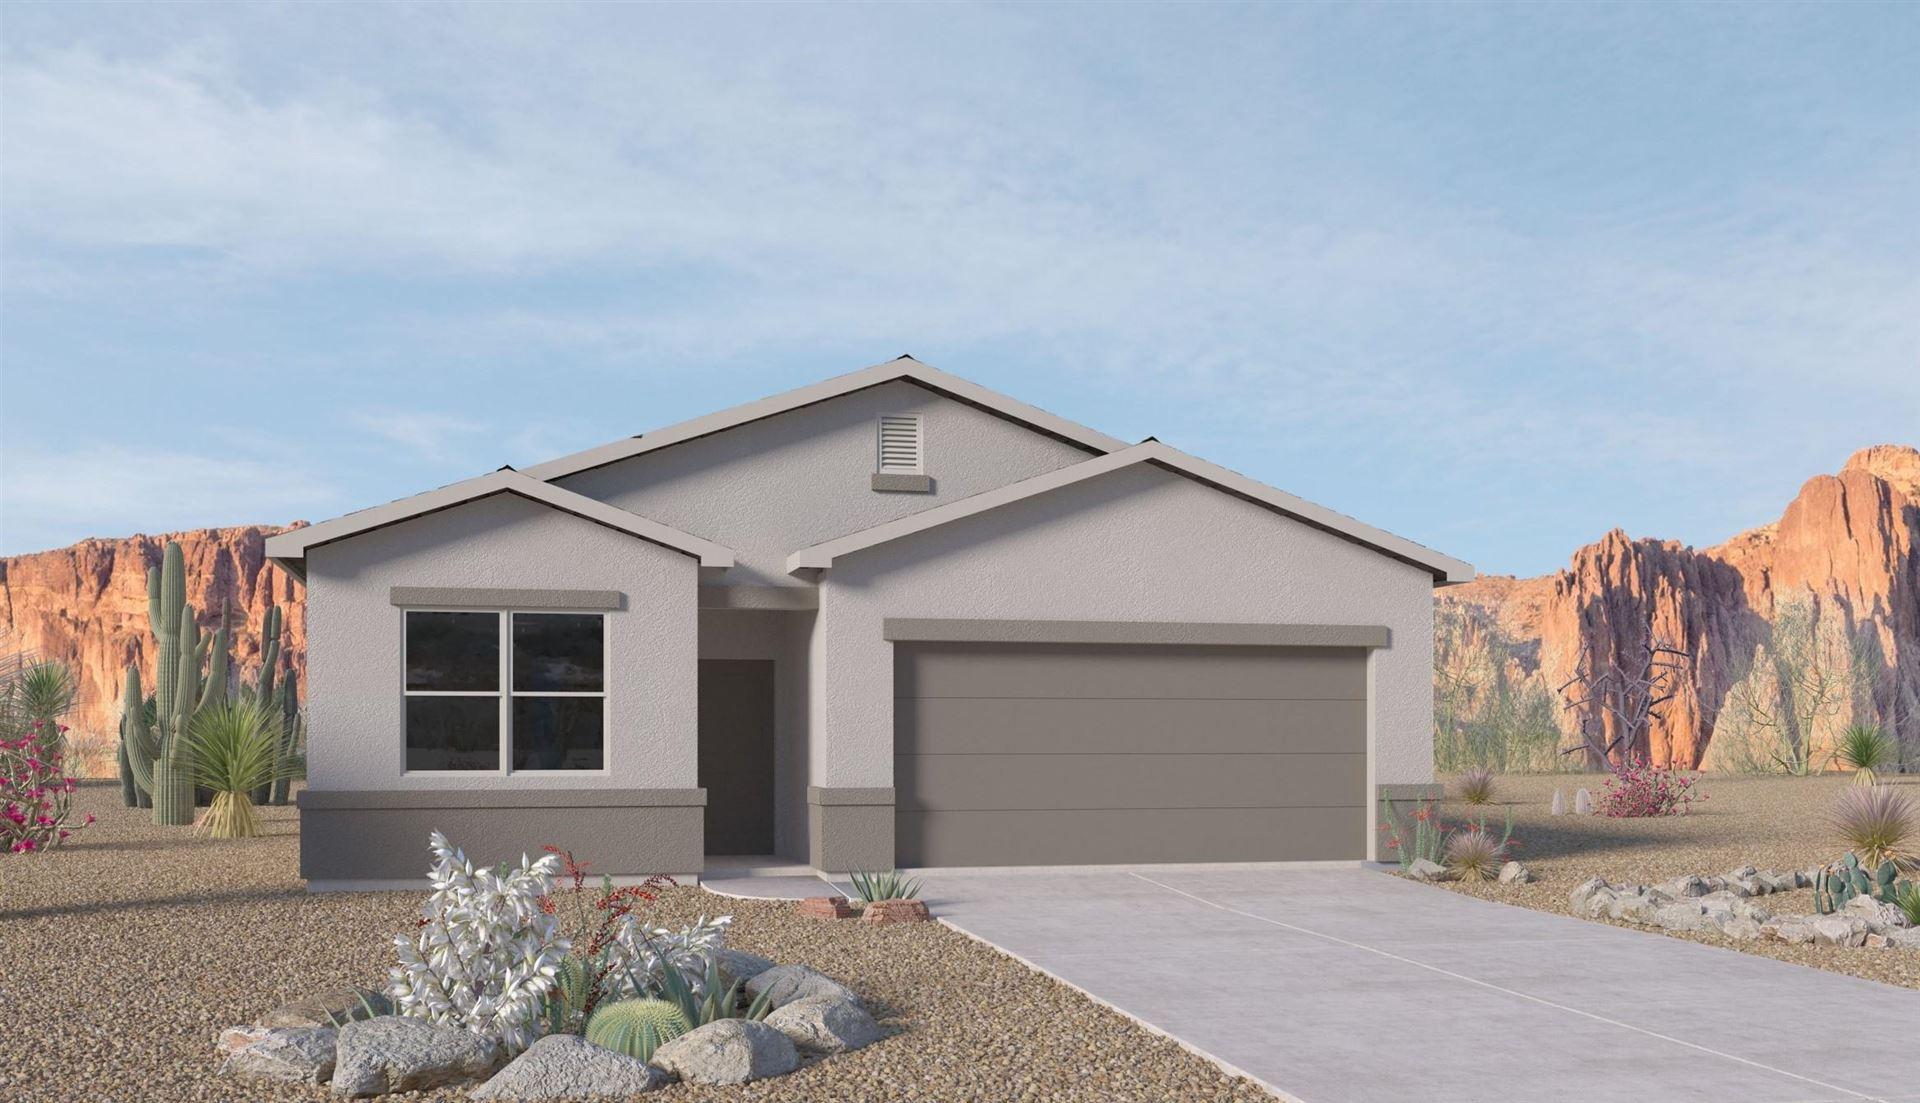 Photo of 2115 Solitaire NE, Rio Rancho, NM 87144 (MLS # 979919)